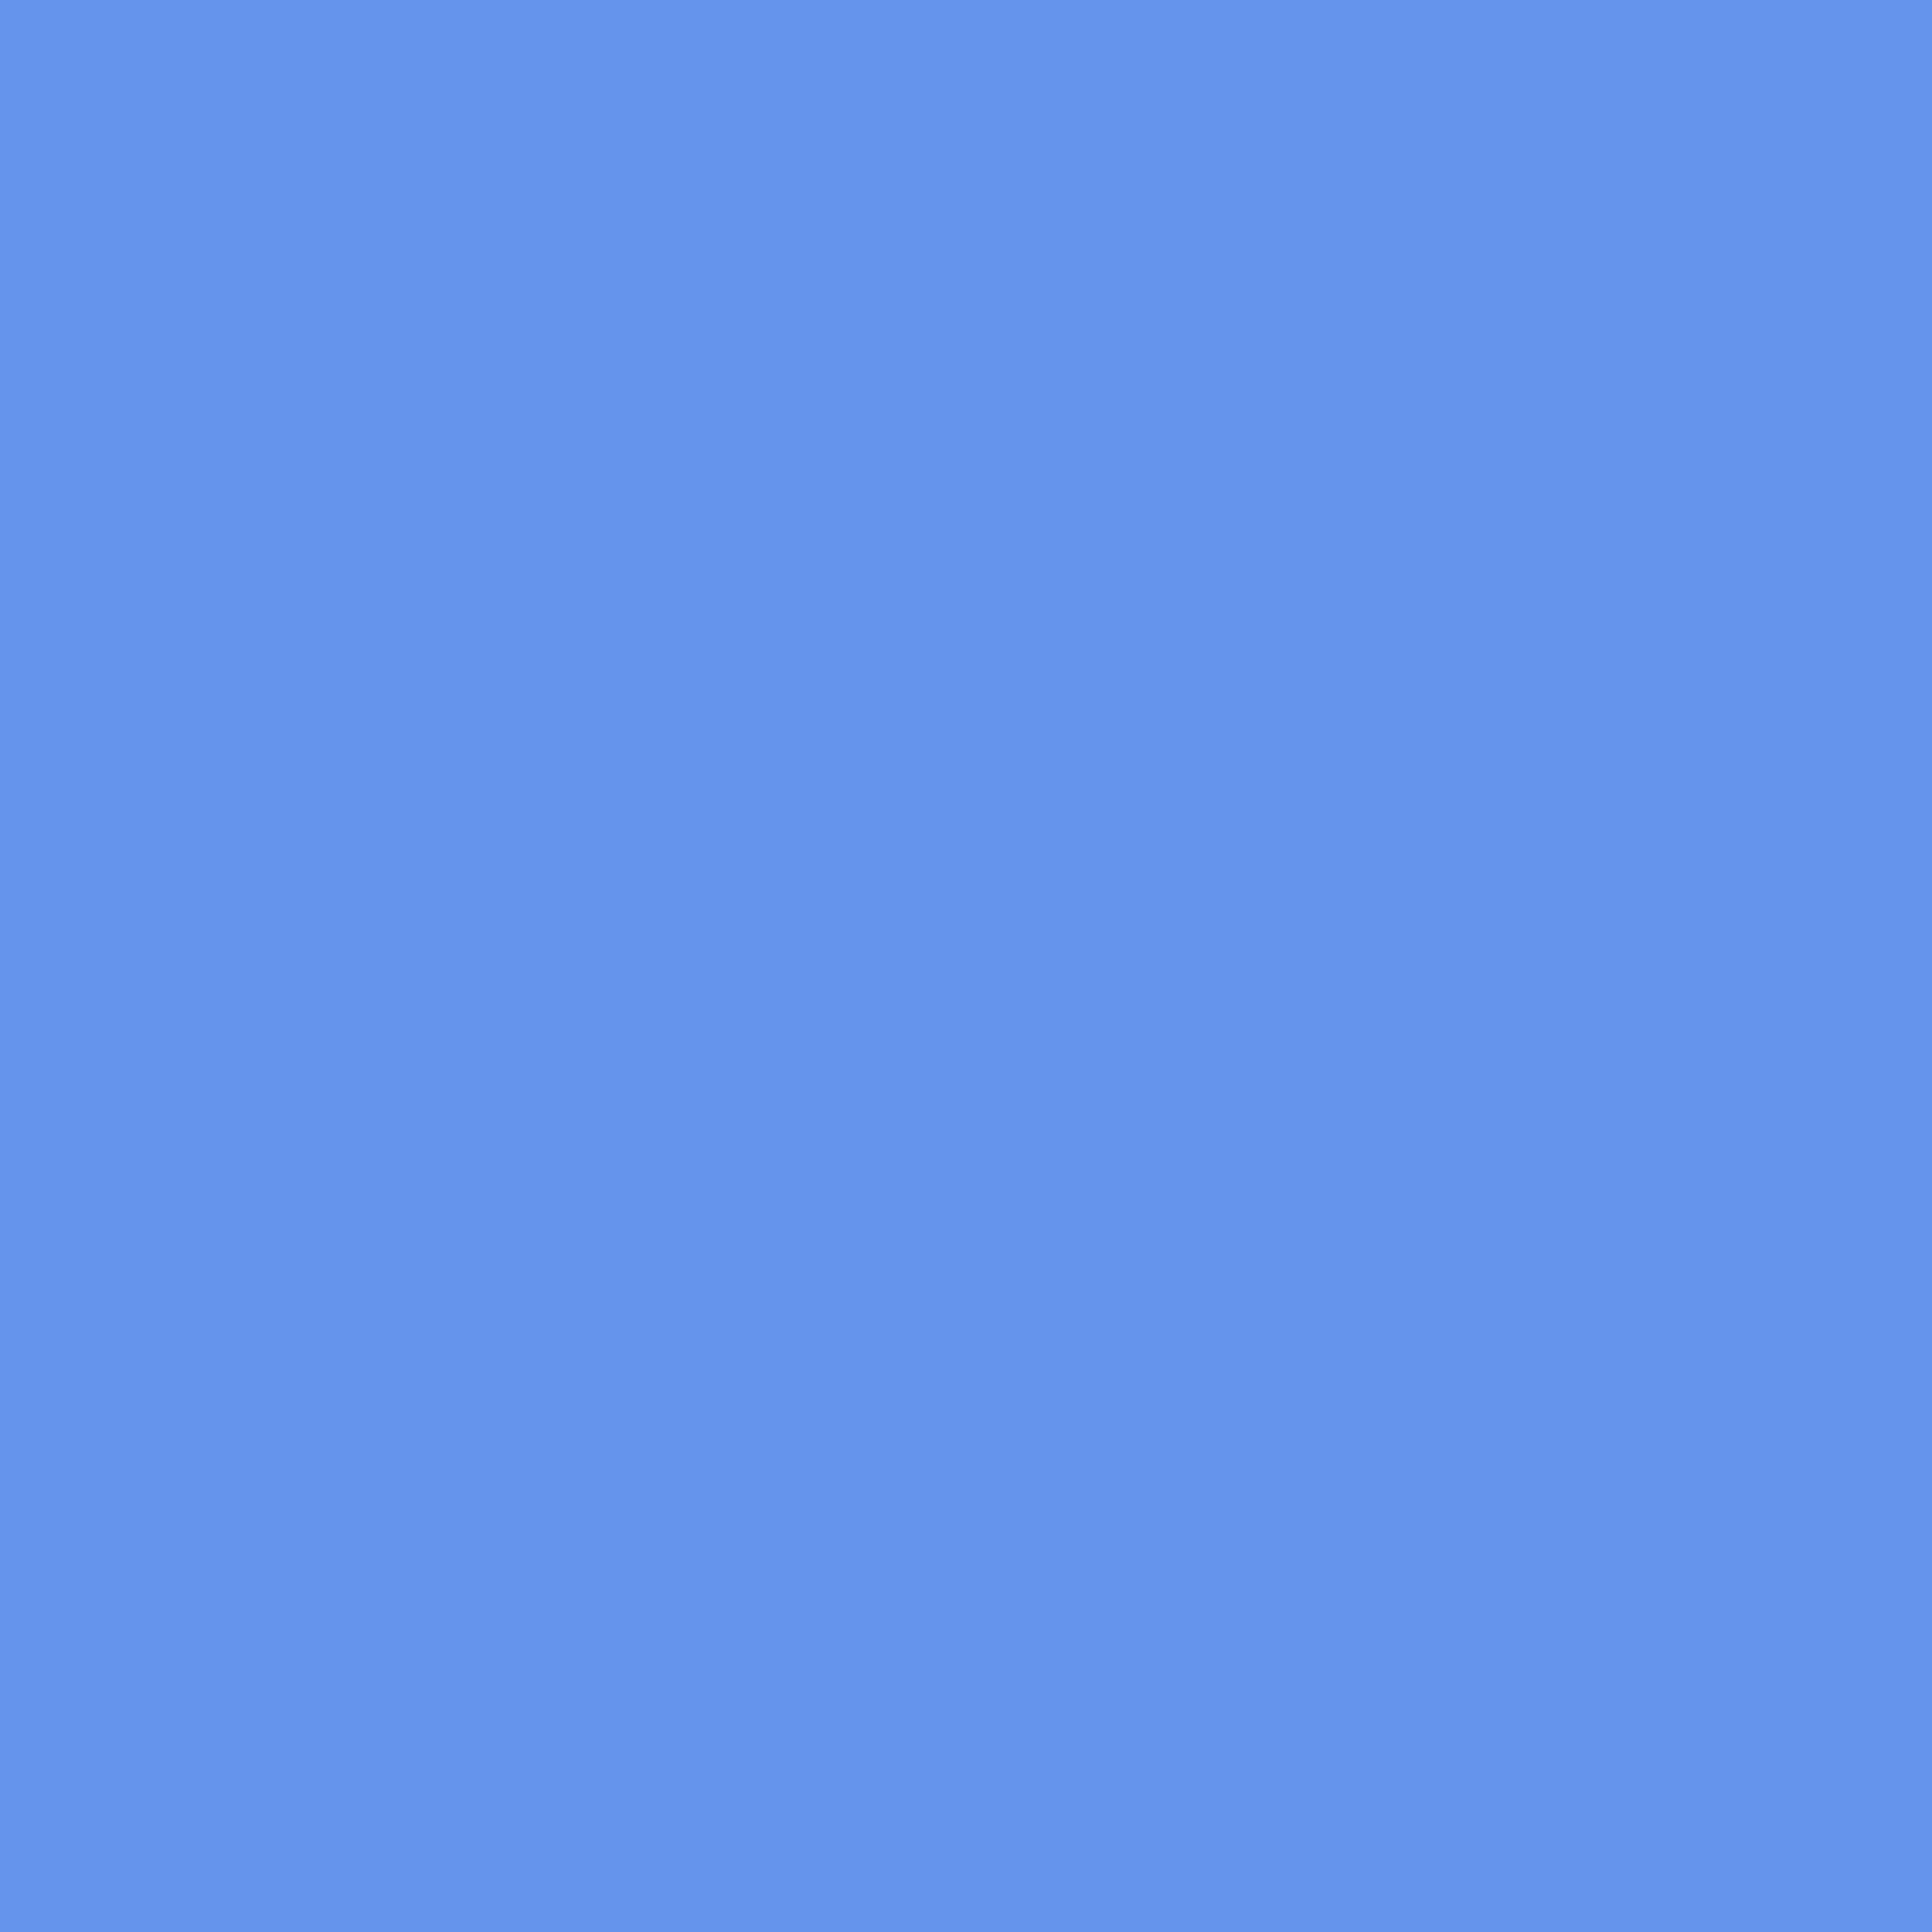 3600x3600 Cornflower Blue Solid Color Background